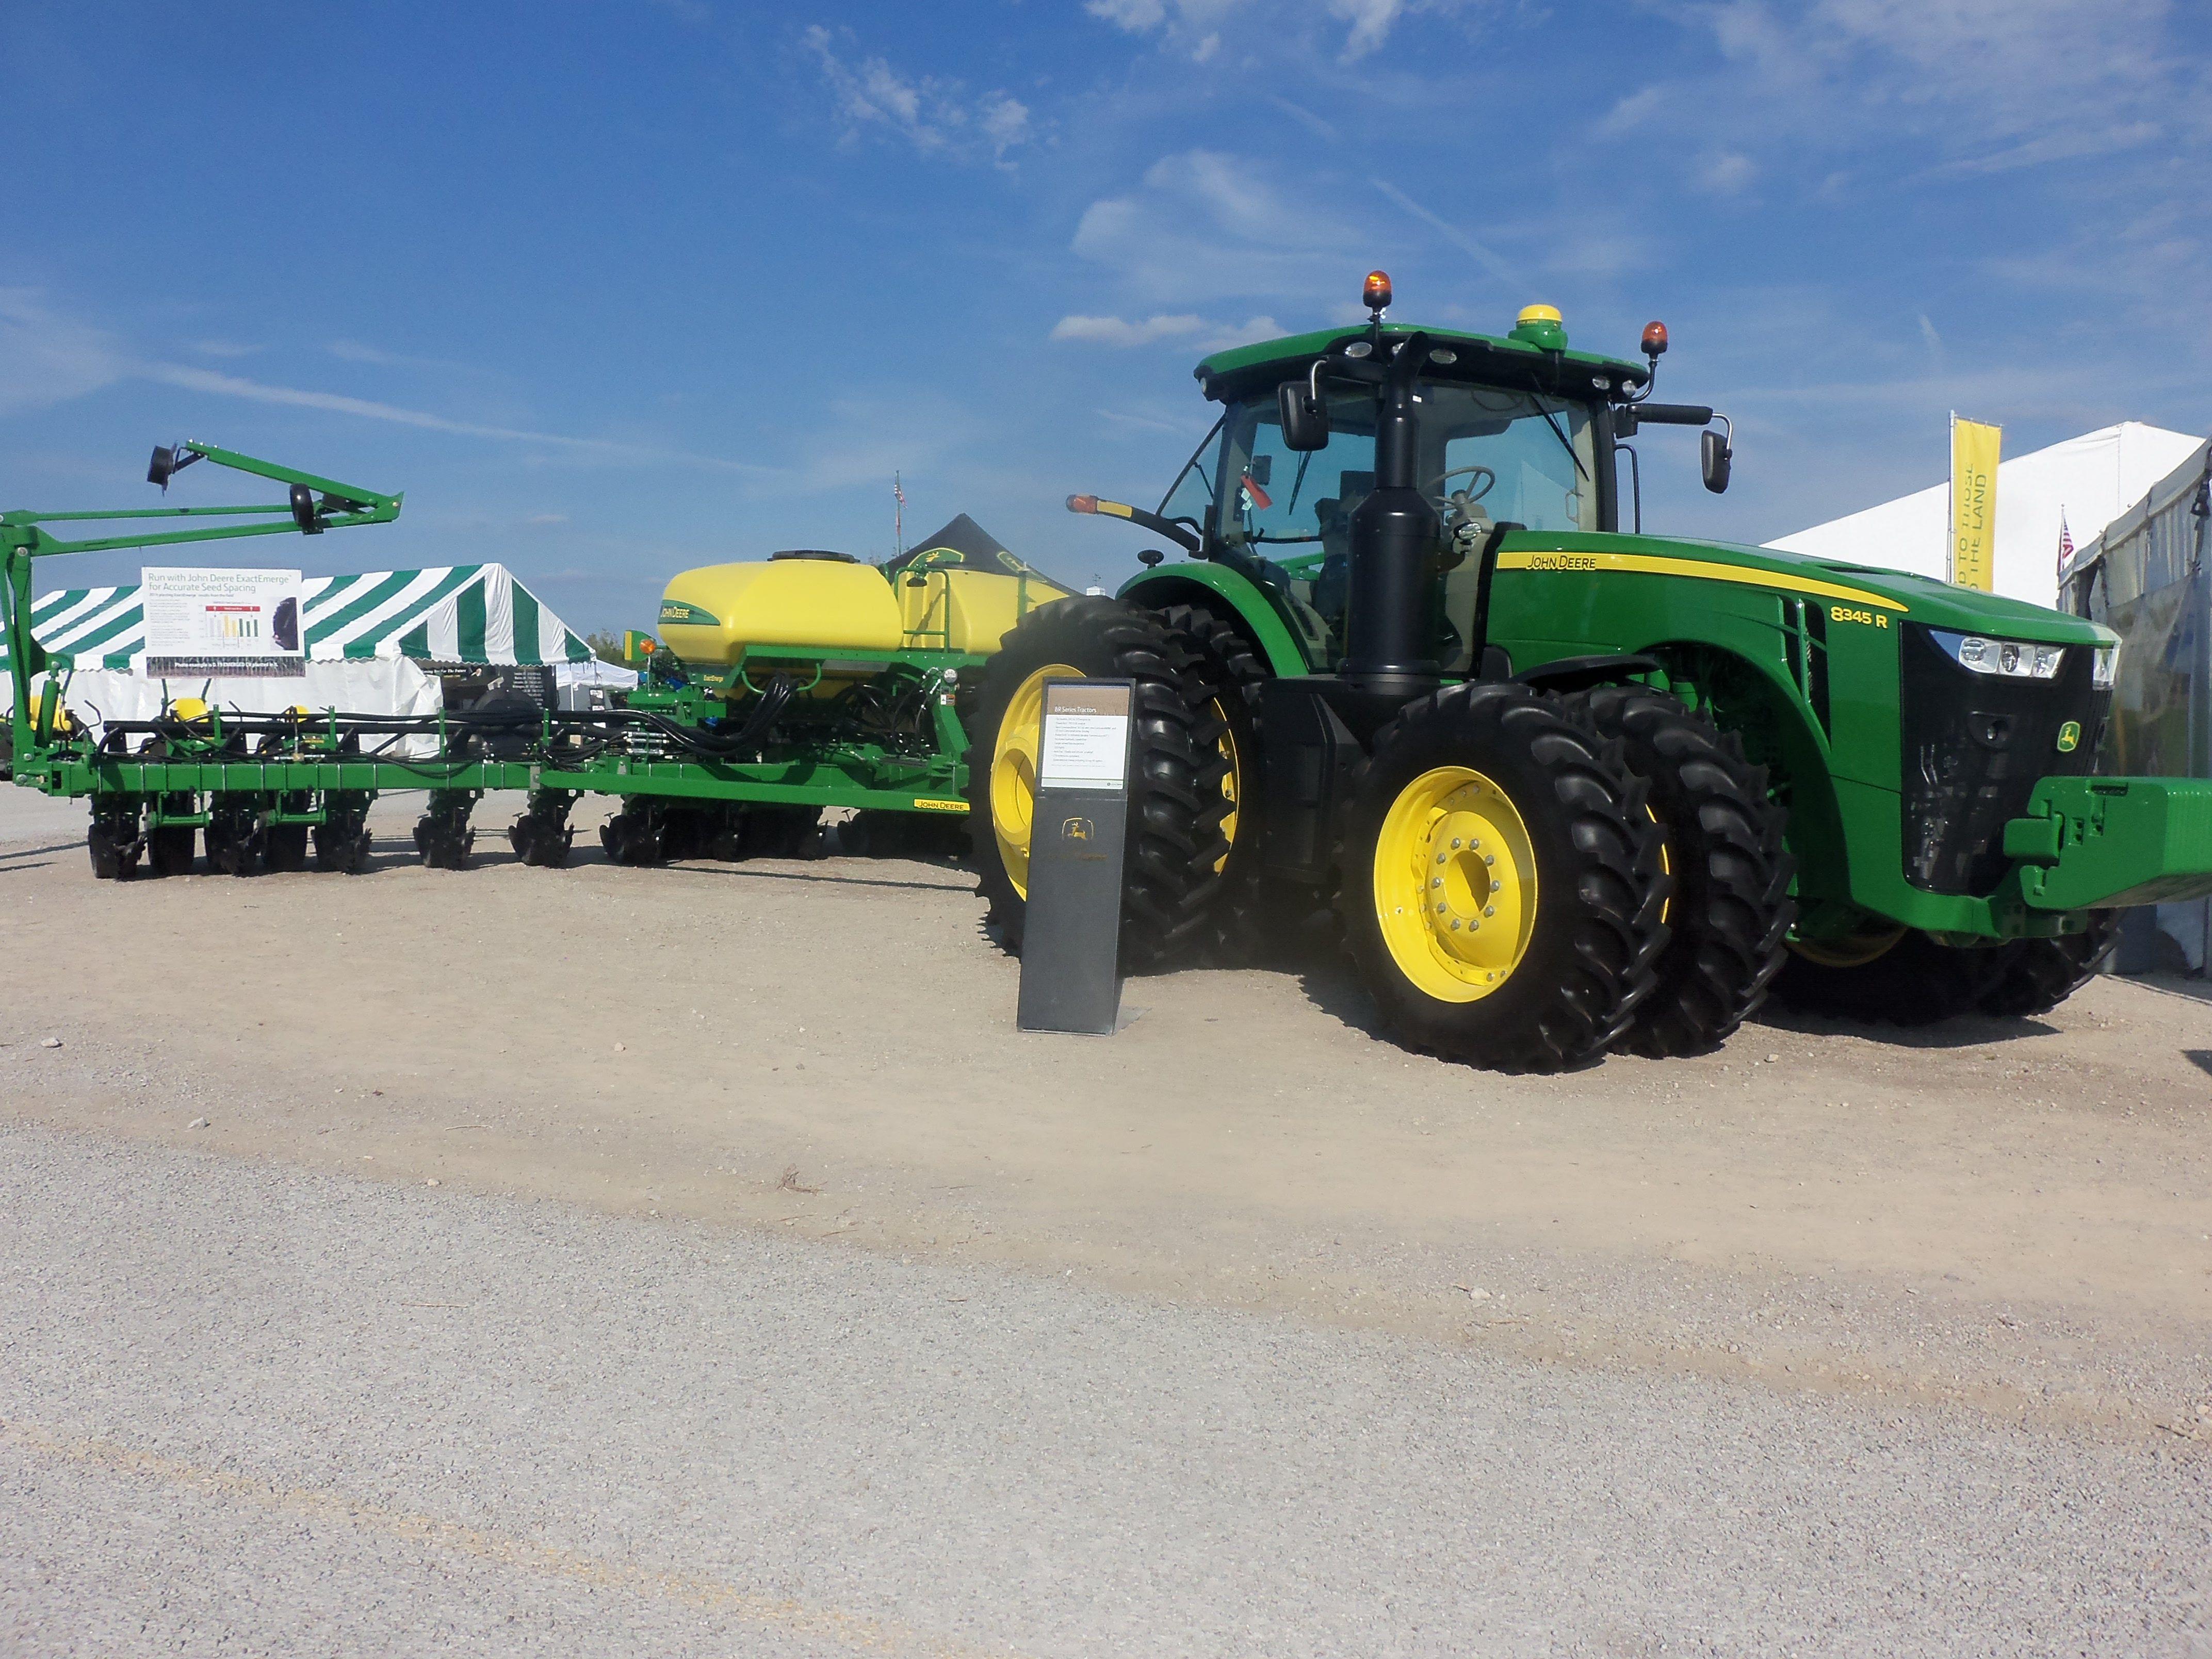 John Deere 8345r Hooked To 16 Row Exactemerge 1775nt Corn Planter